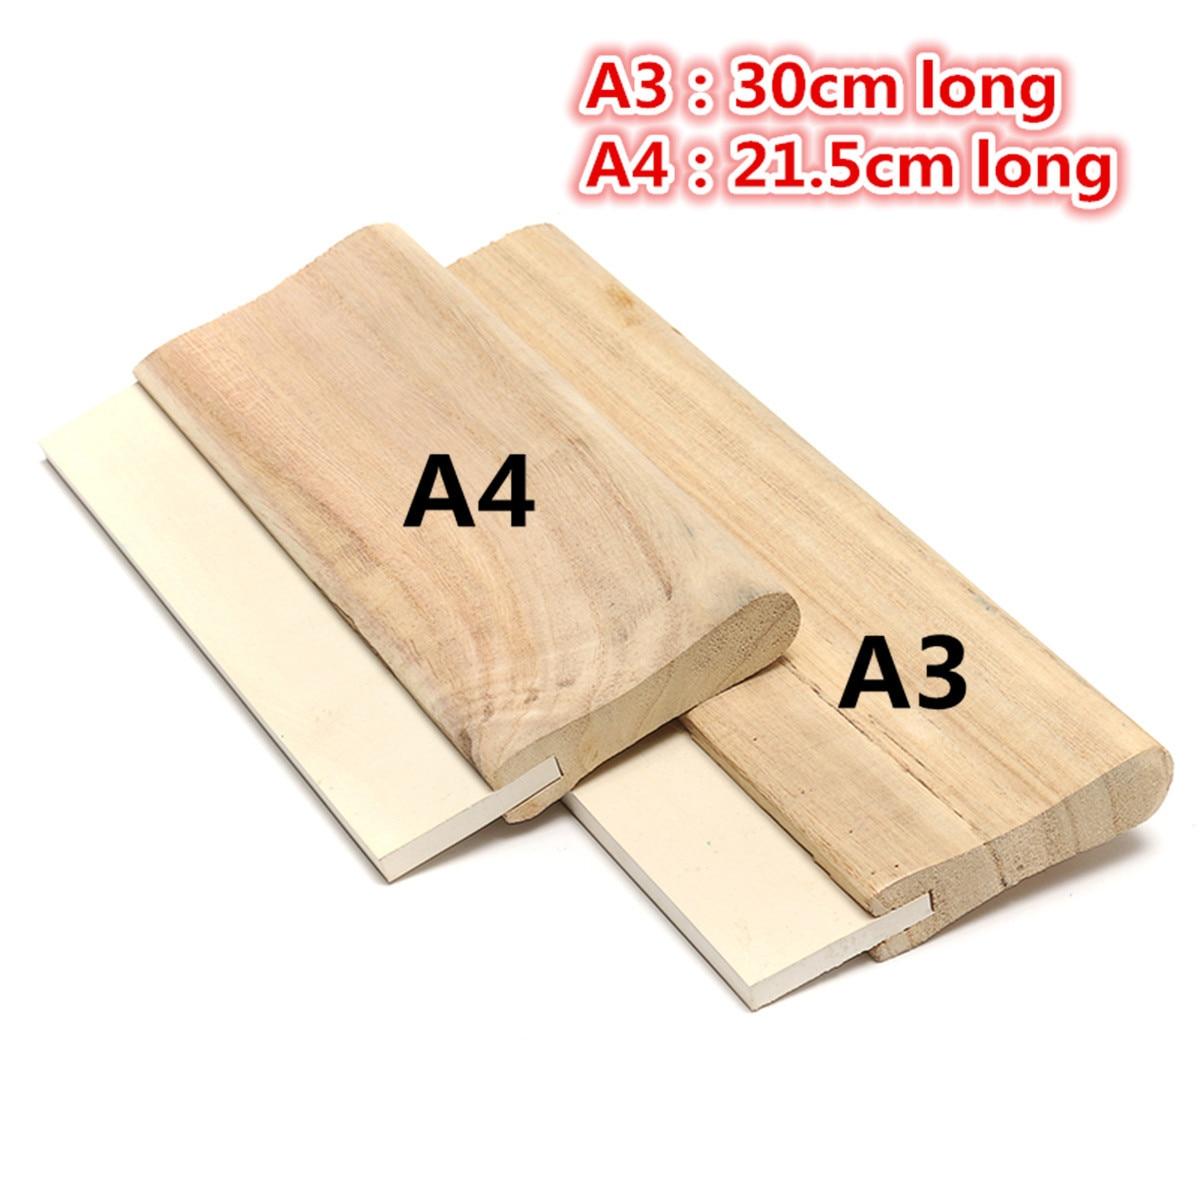 A4/A3 Silk Screen Printing Squeegee Blade Wood Handle Printing Squeegee Scraper For Printing 2 Sizes